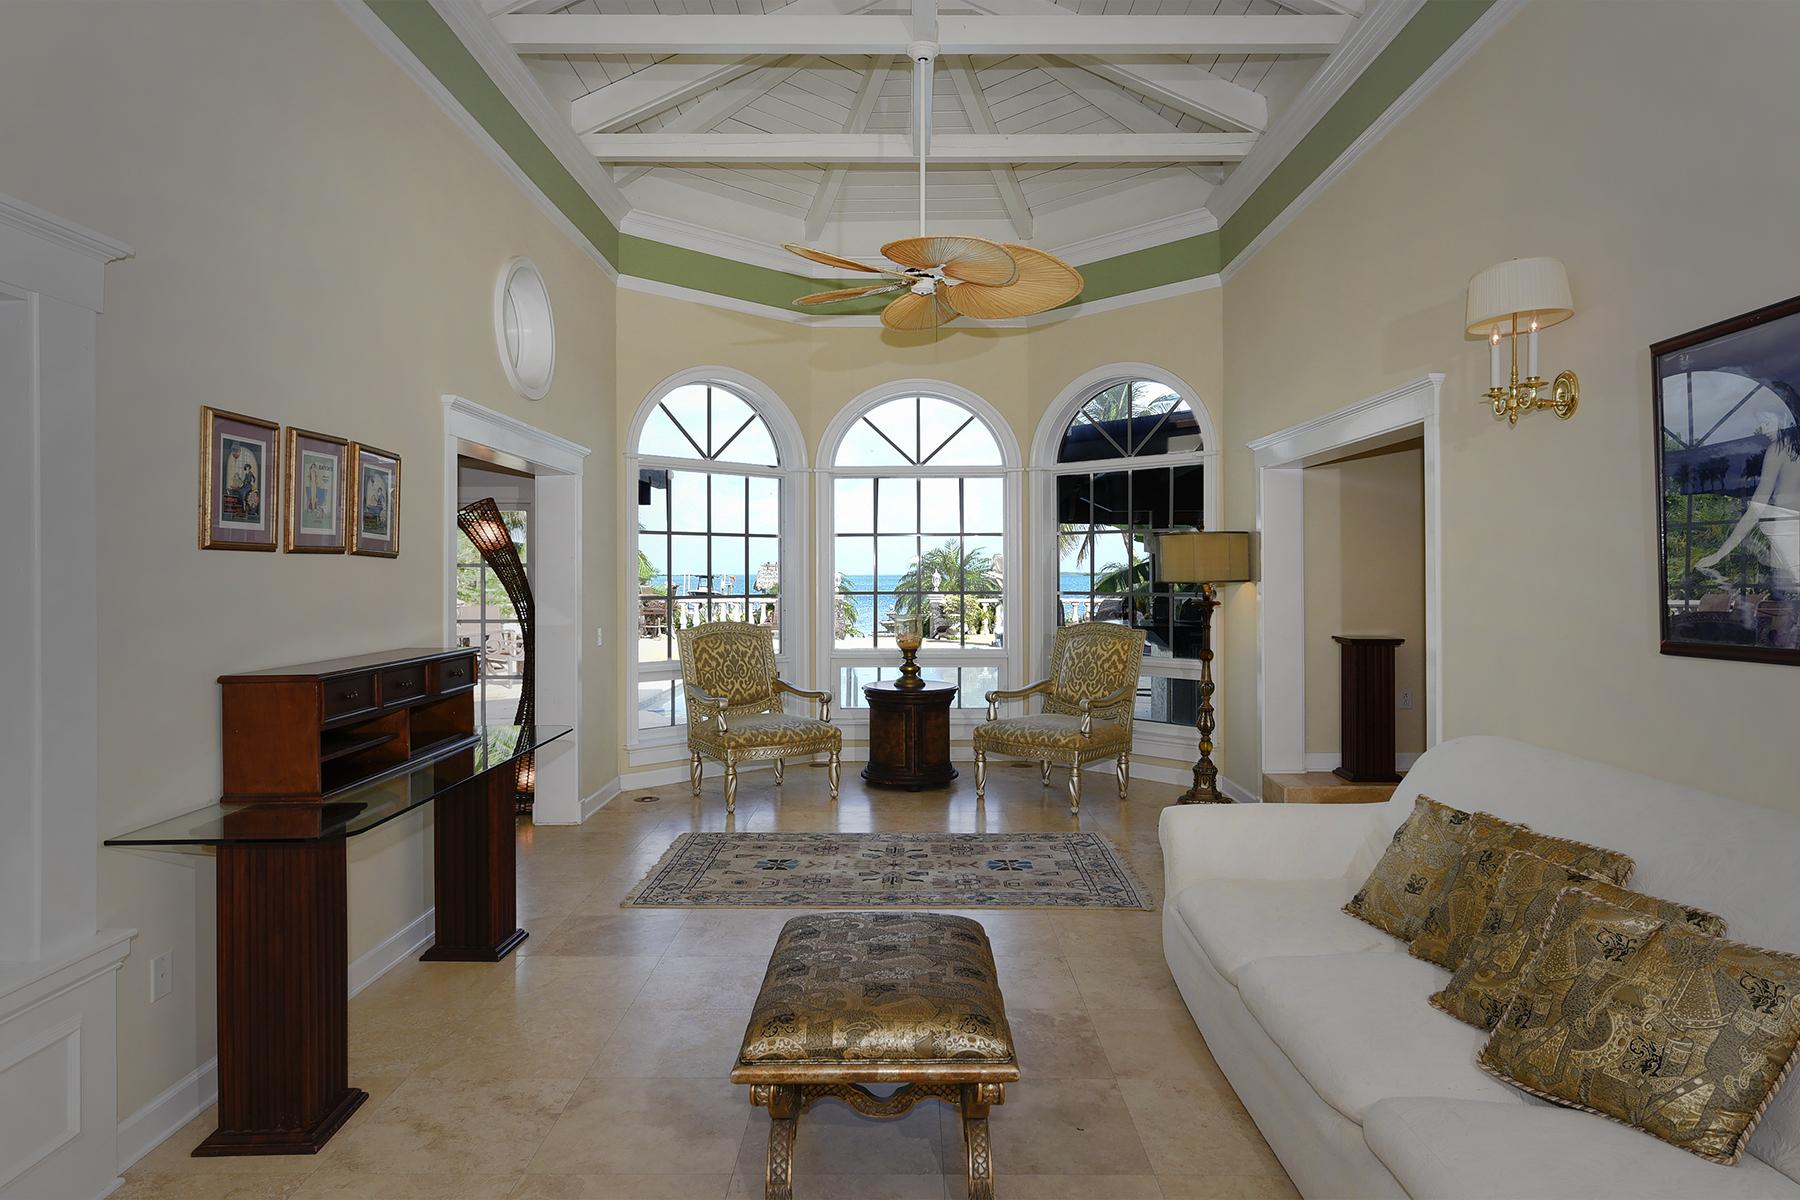 Additional photo for property listing at Elegance on the Bay 97240 Overseas Highway Key Largo, Florida 33037 Estados Unidos